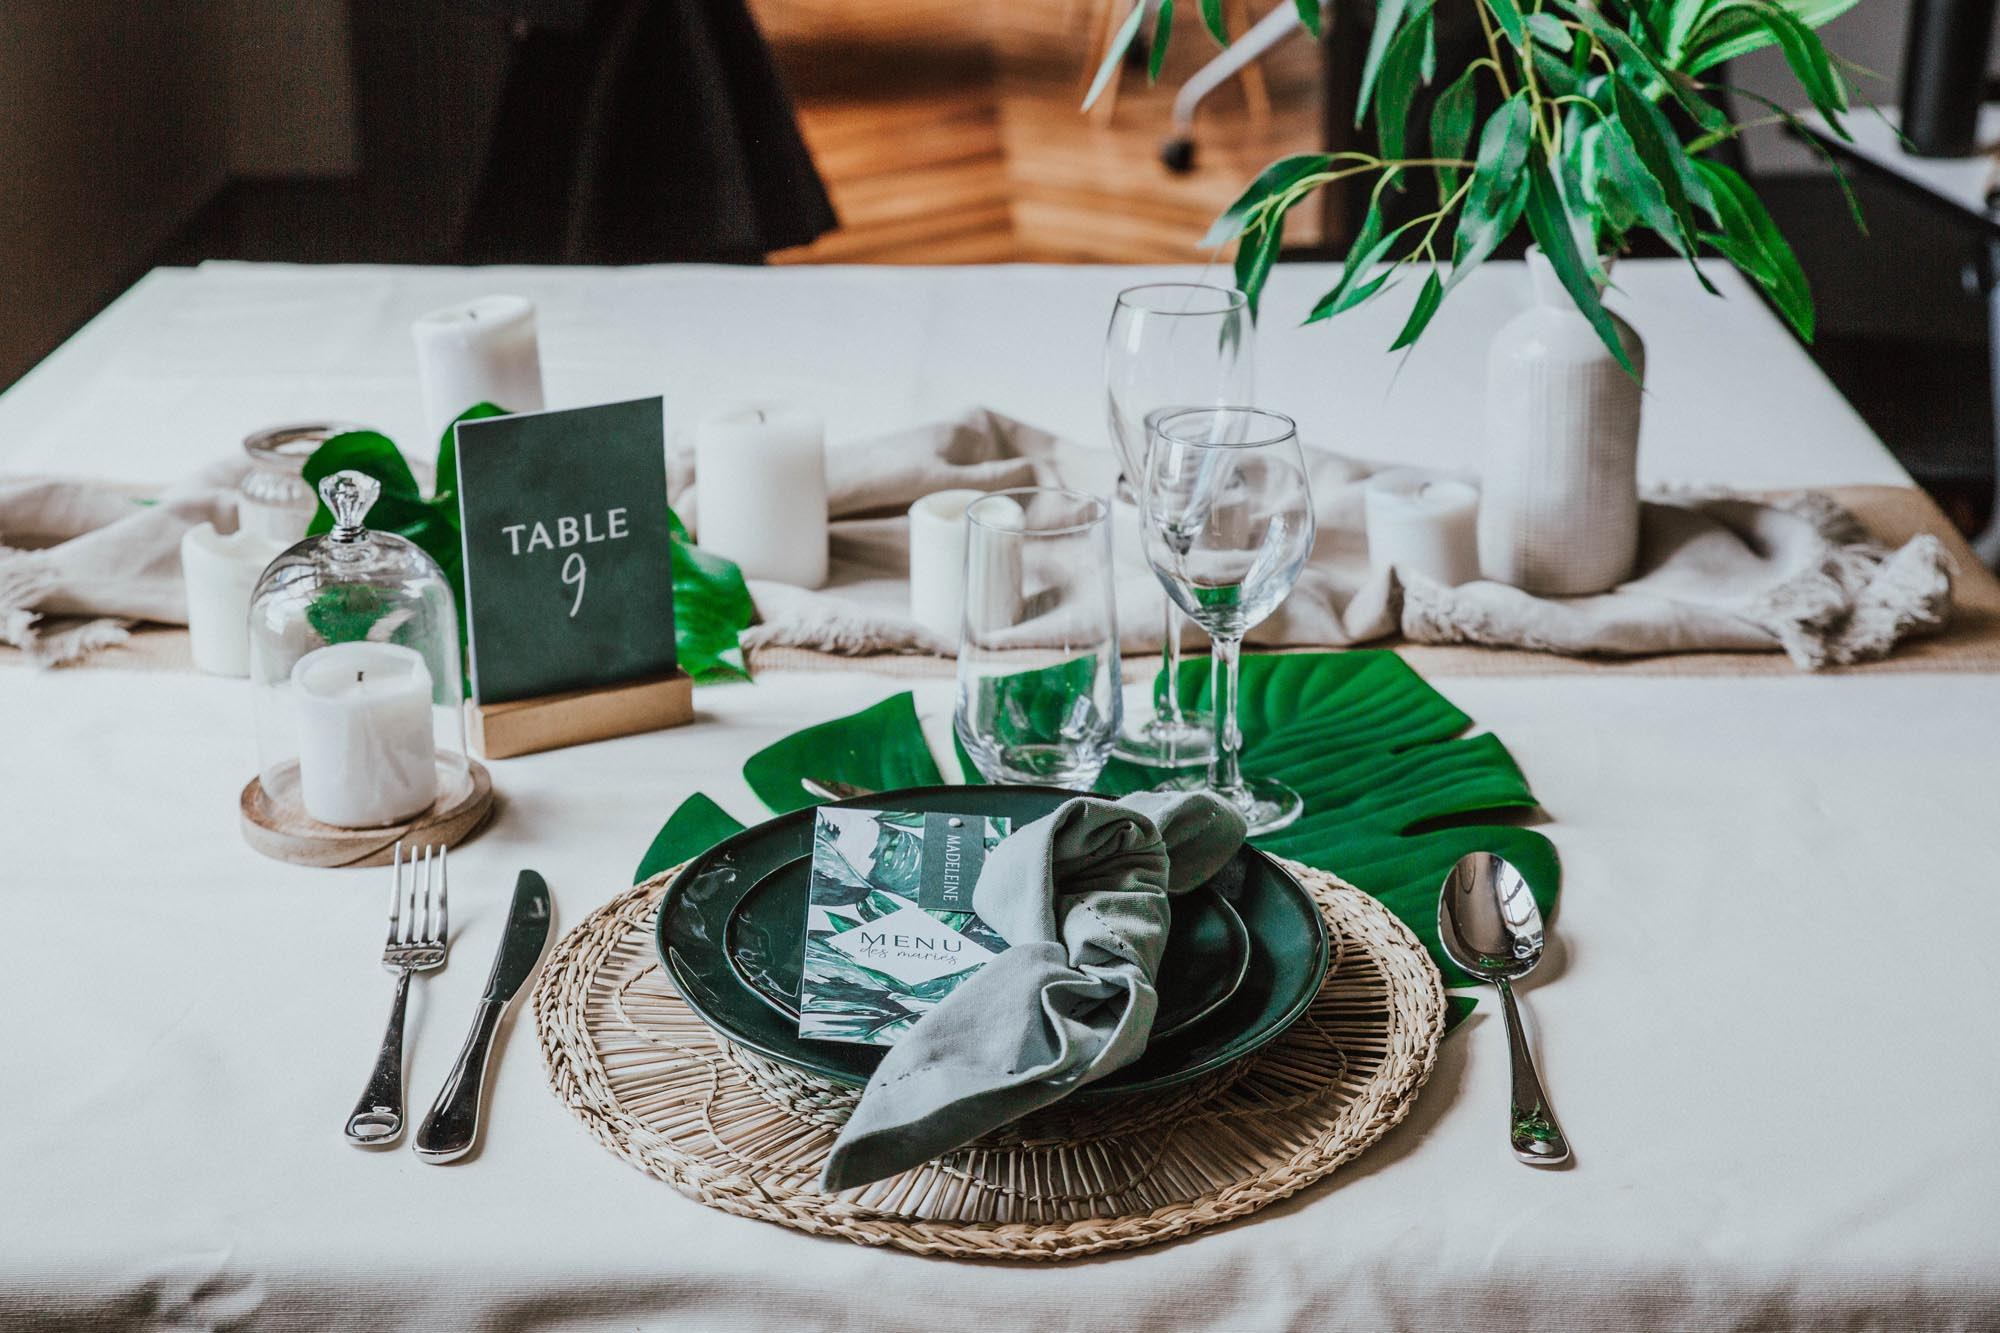 Collection tropique vert et blanc feuillage